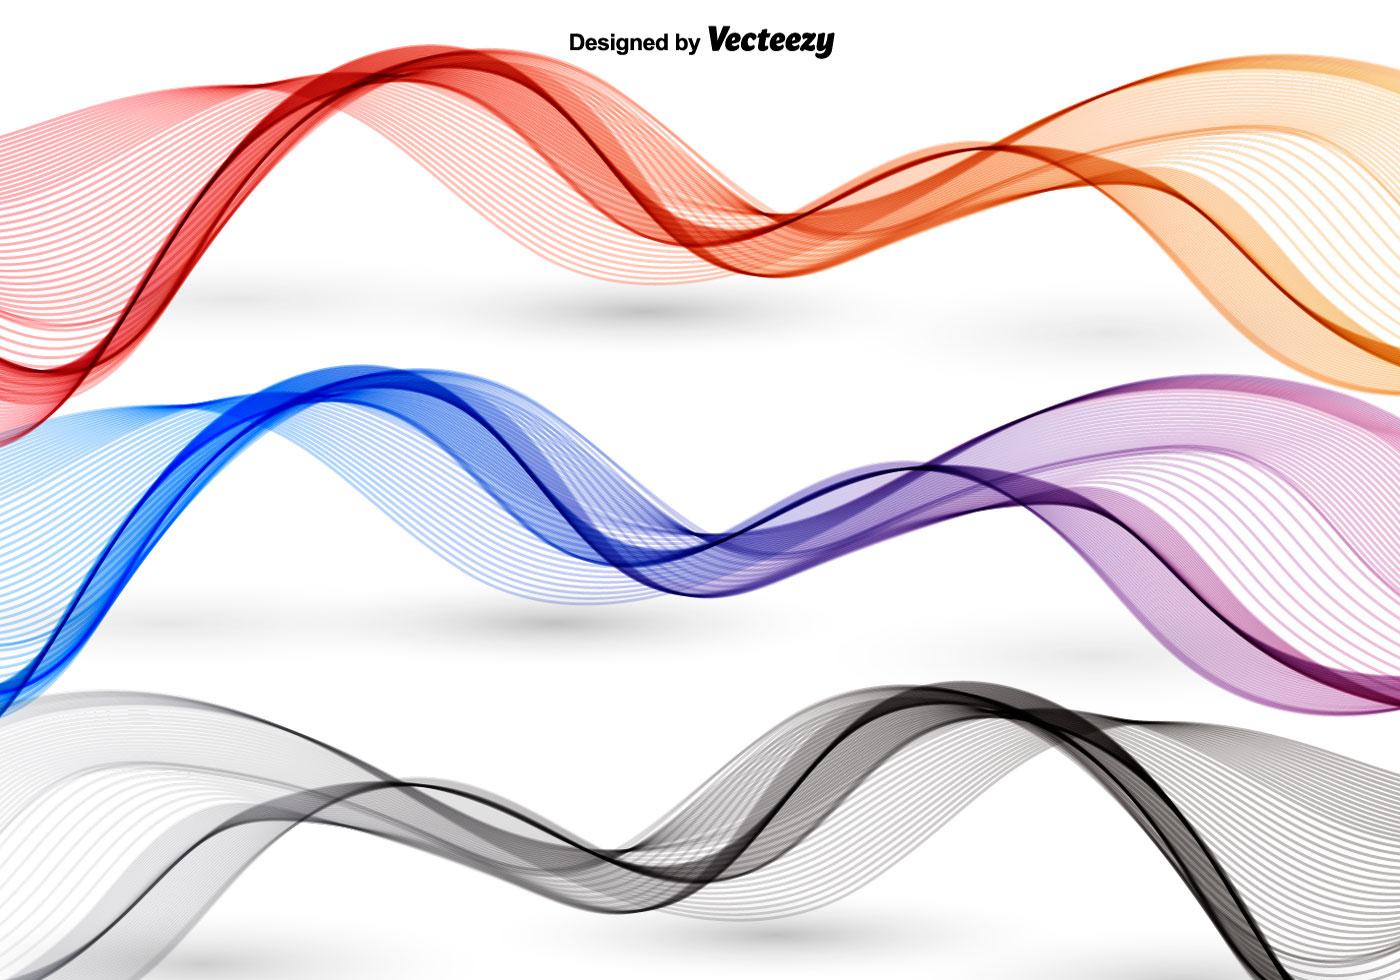 Waves Free Vector Art - (16499 Free Downloads)